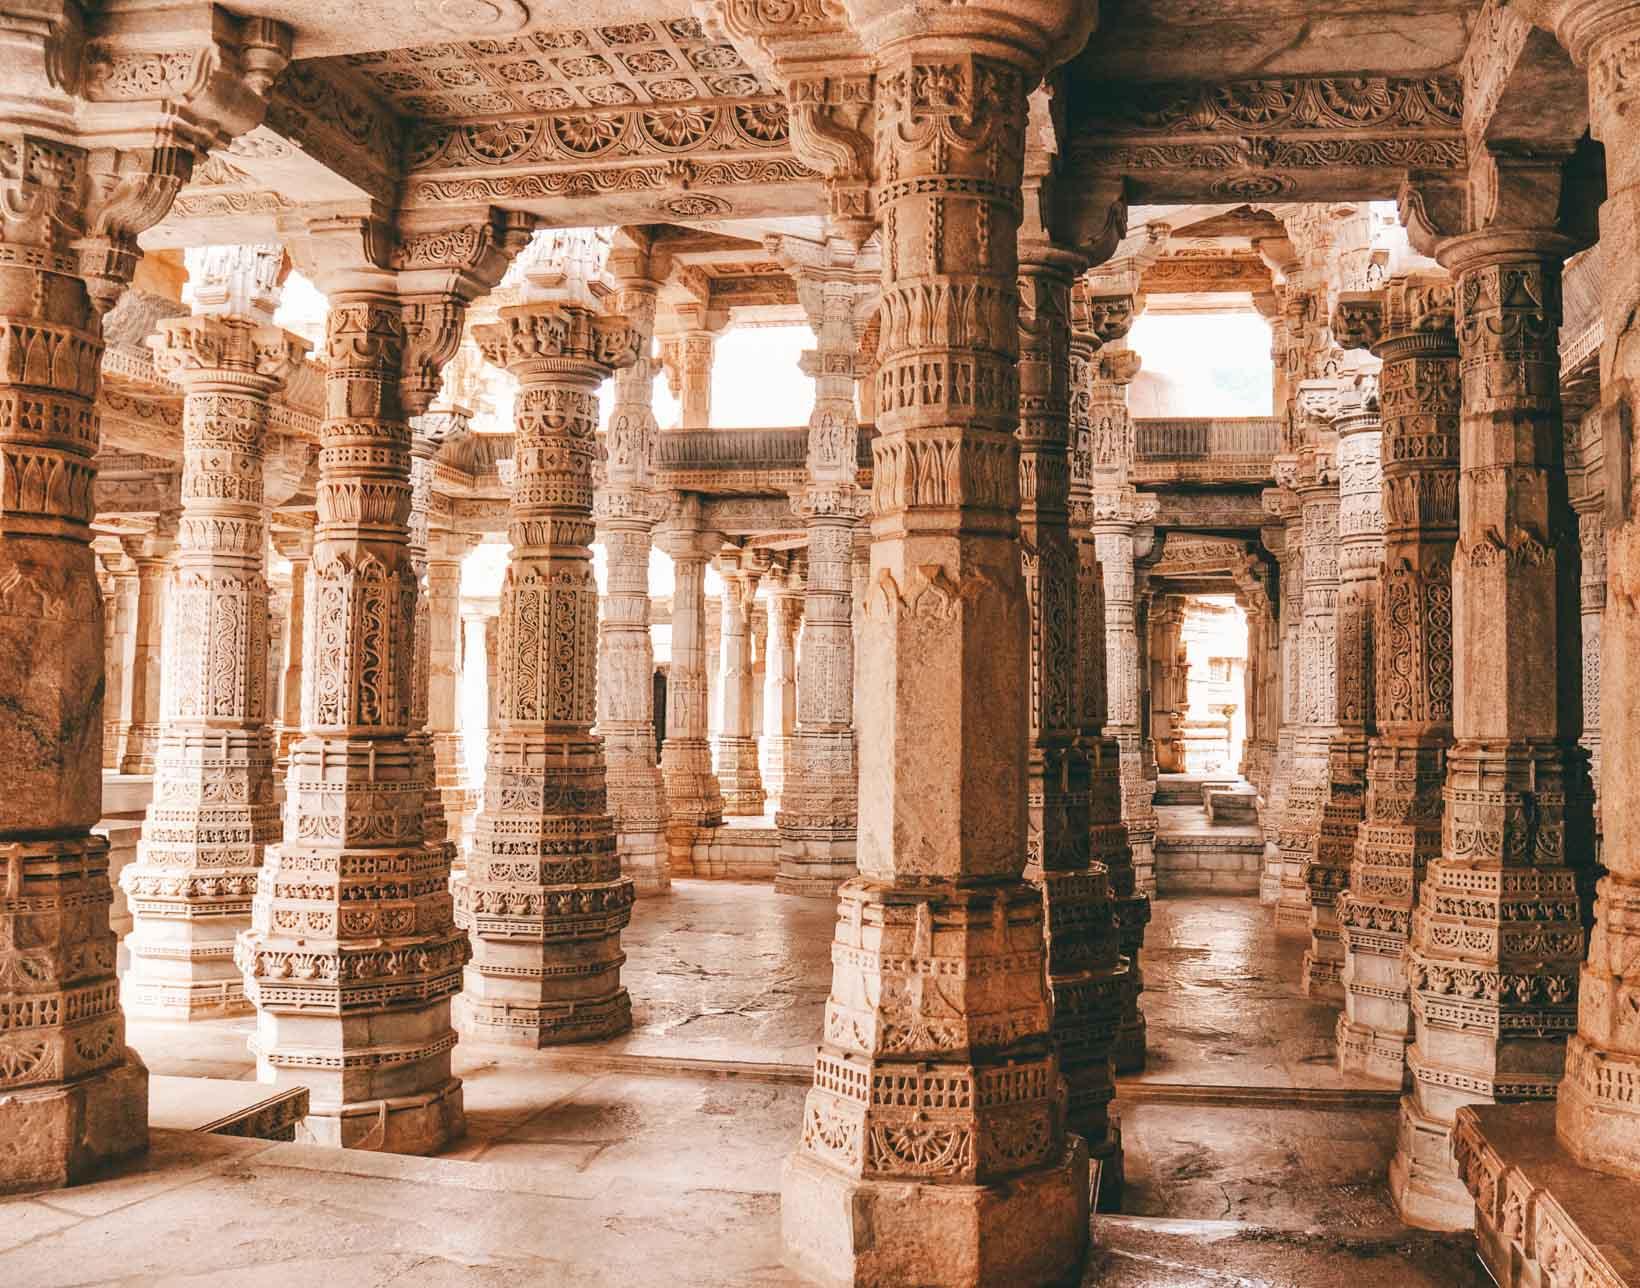 Tempio giainista a Ranakpur in Rajasthan